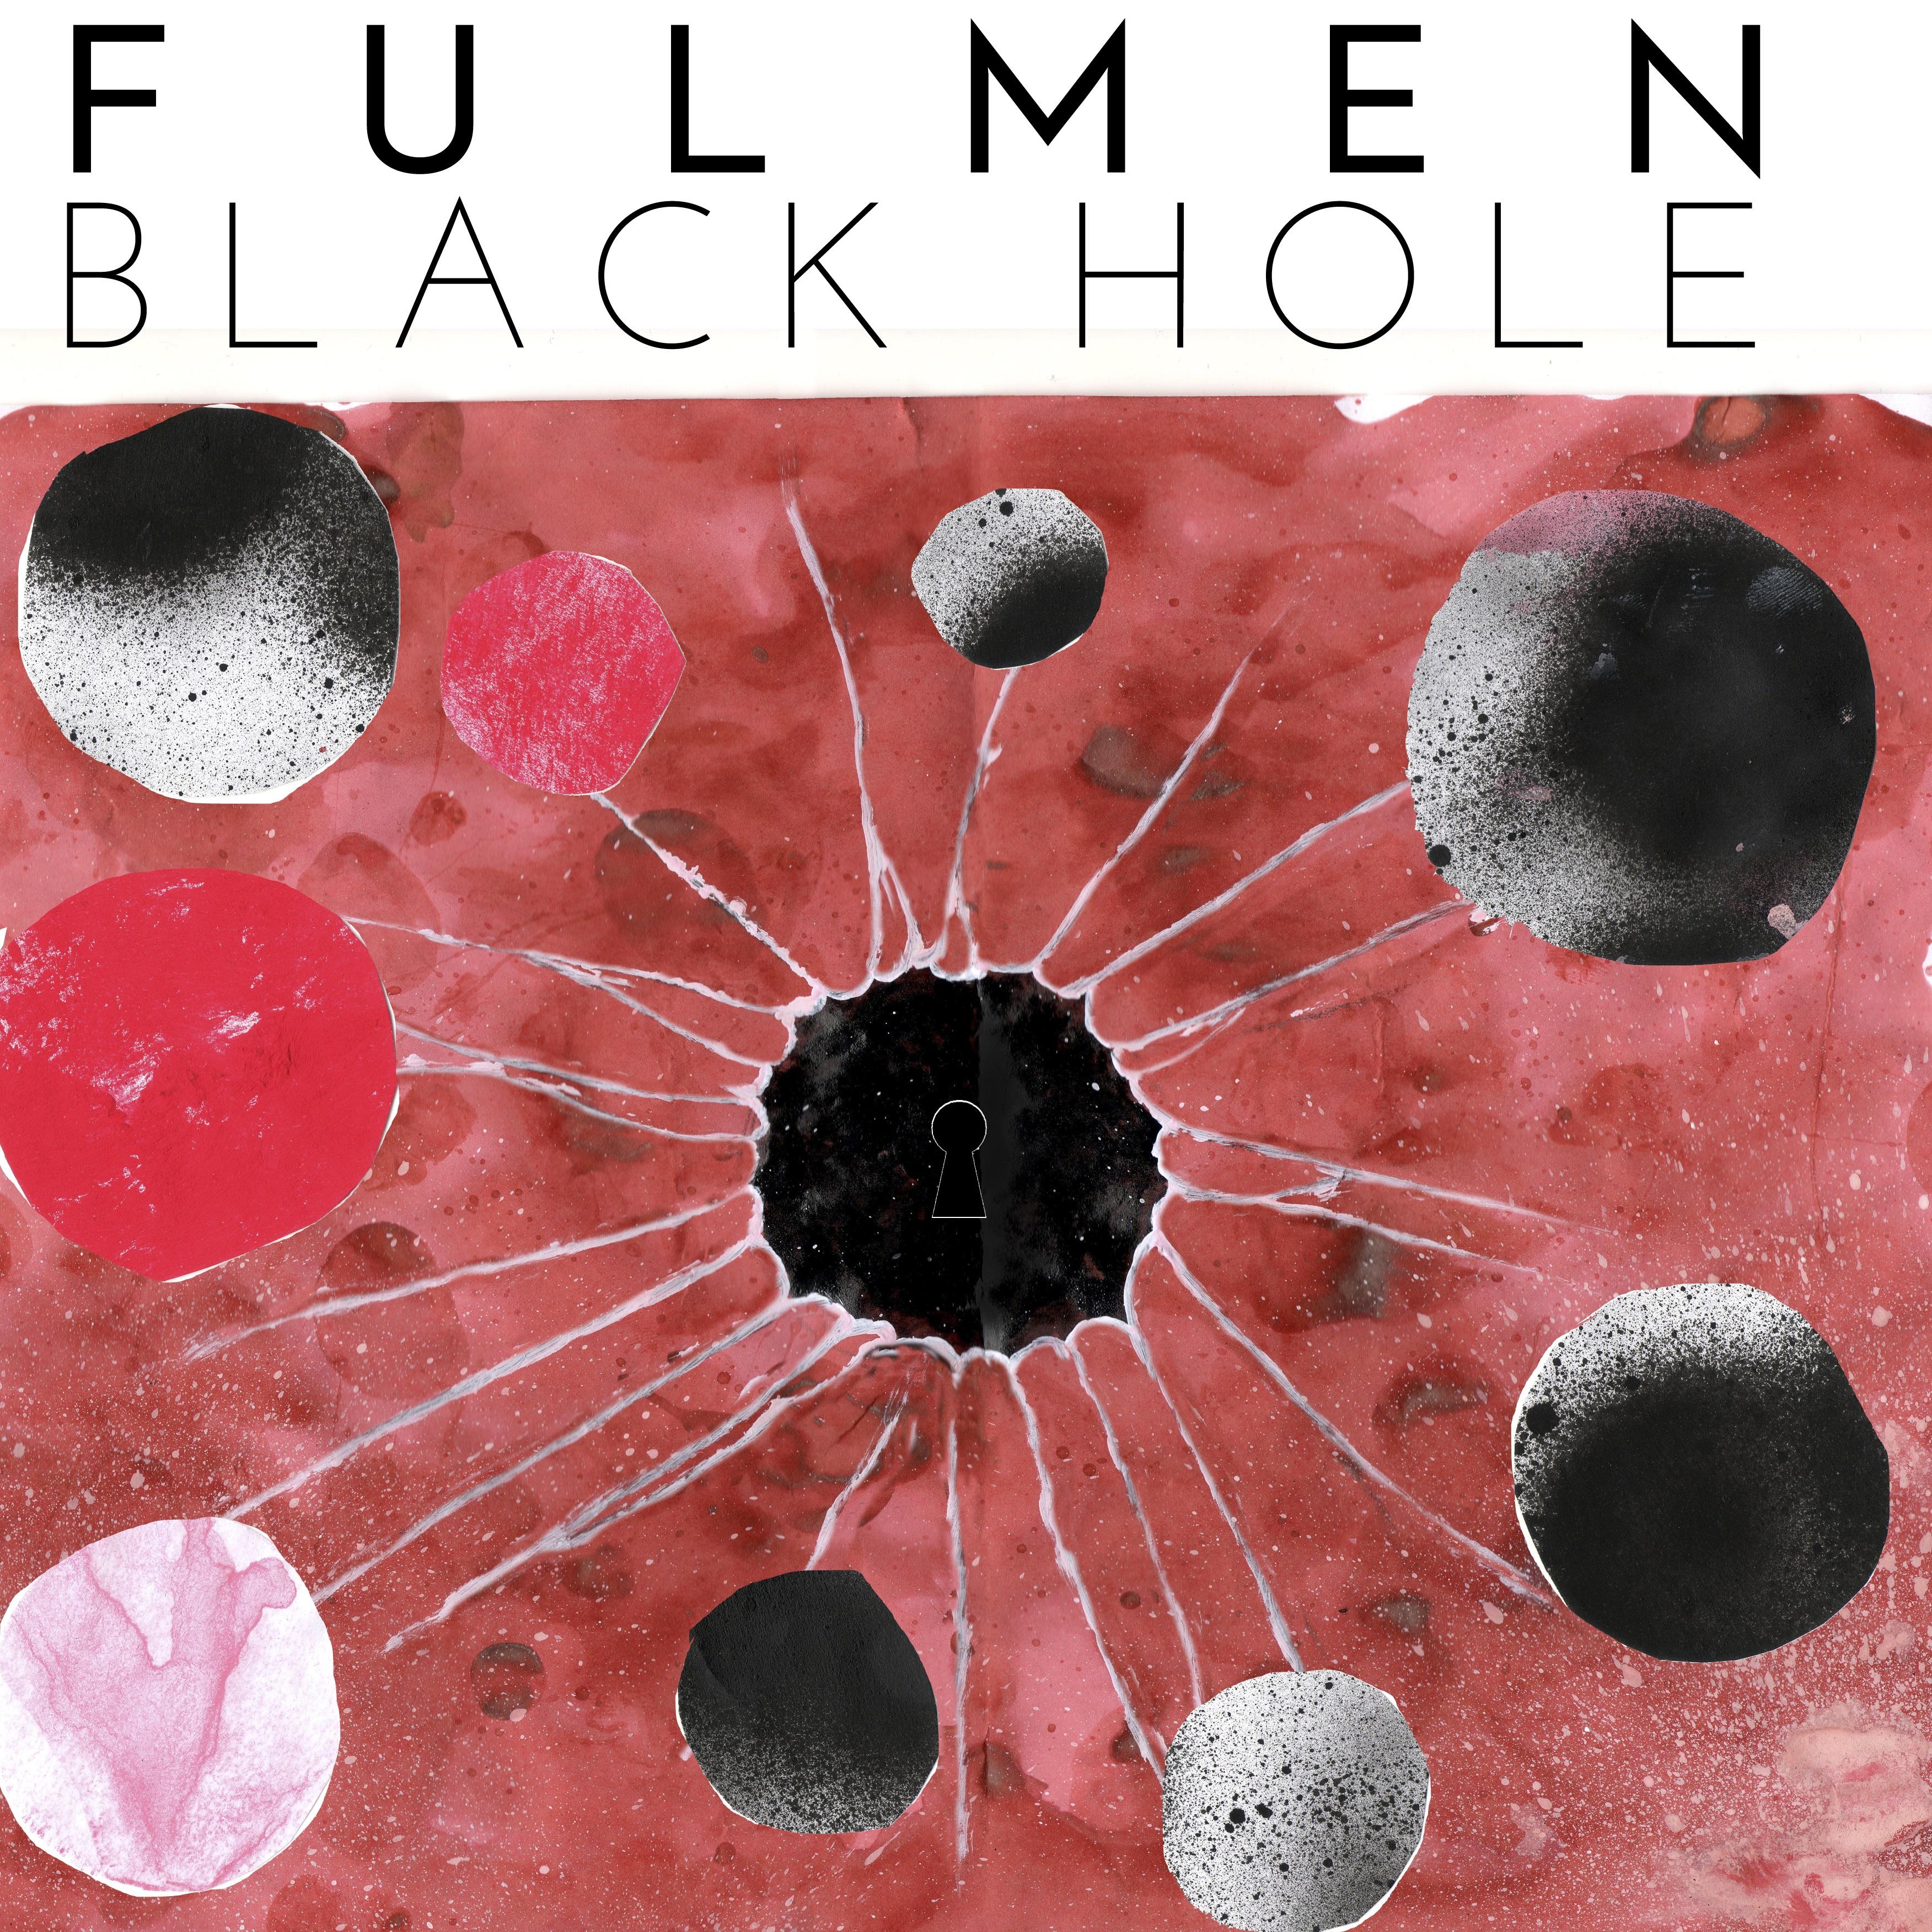 Fulmen Black Hole 12.05.17